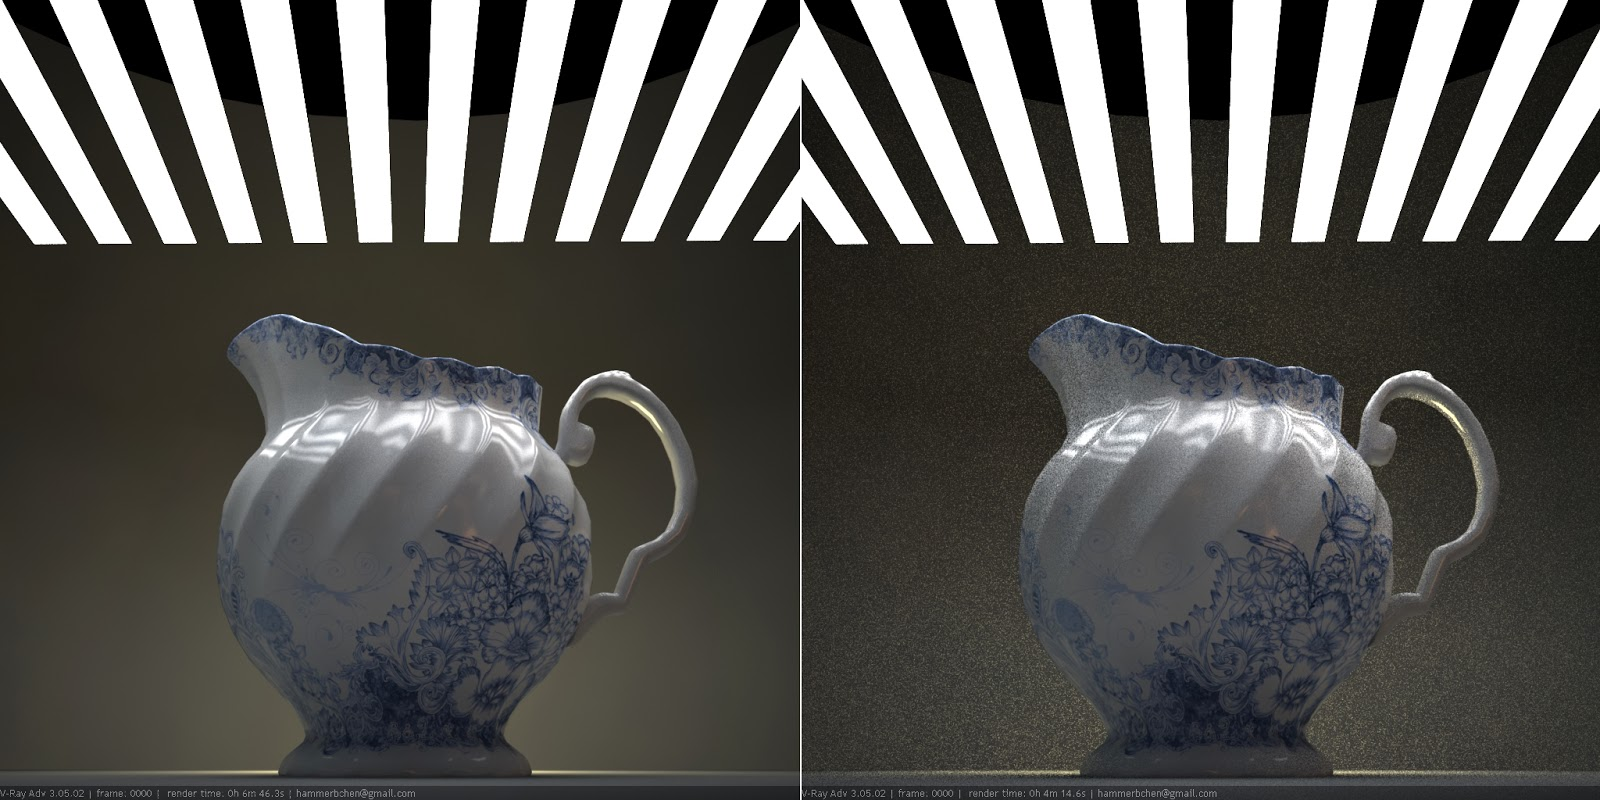 Vray 3 0-17_probalistic_lights_compare.jpg